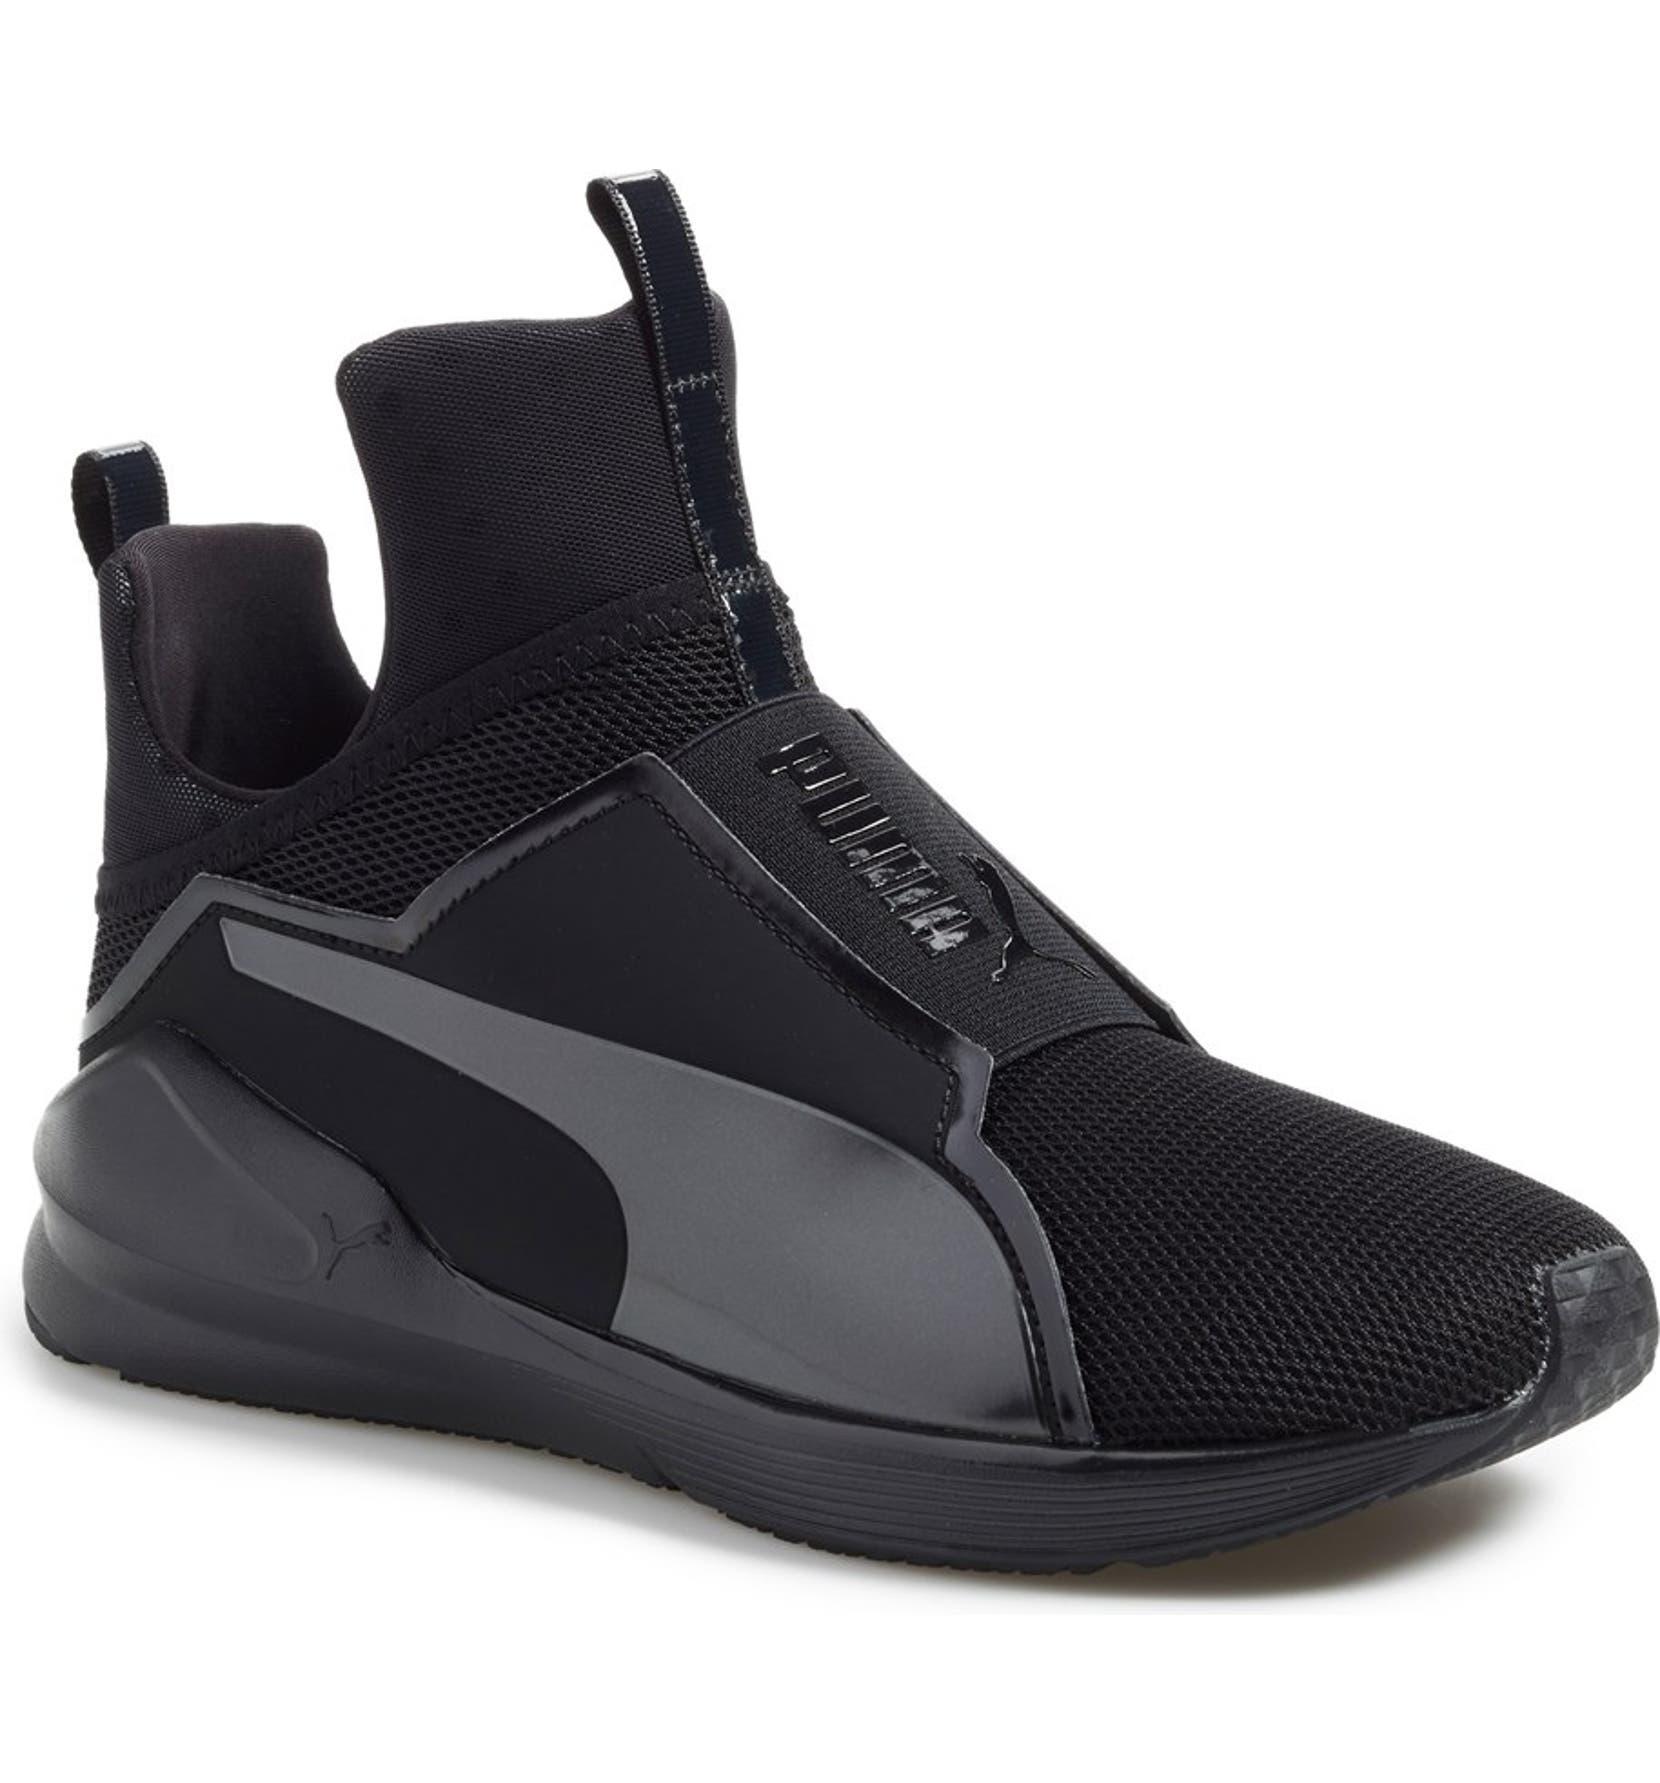 sale retailer de572 eacb9 'Fierce Core' High Top Sneaker